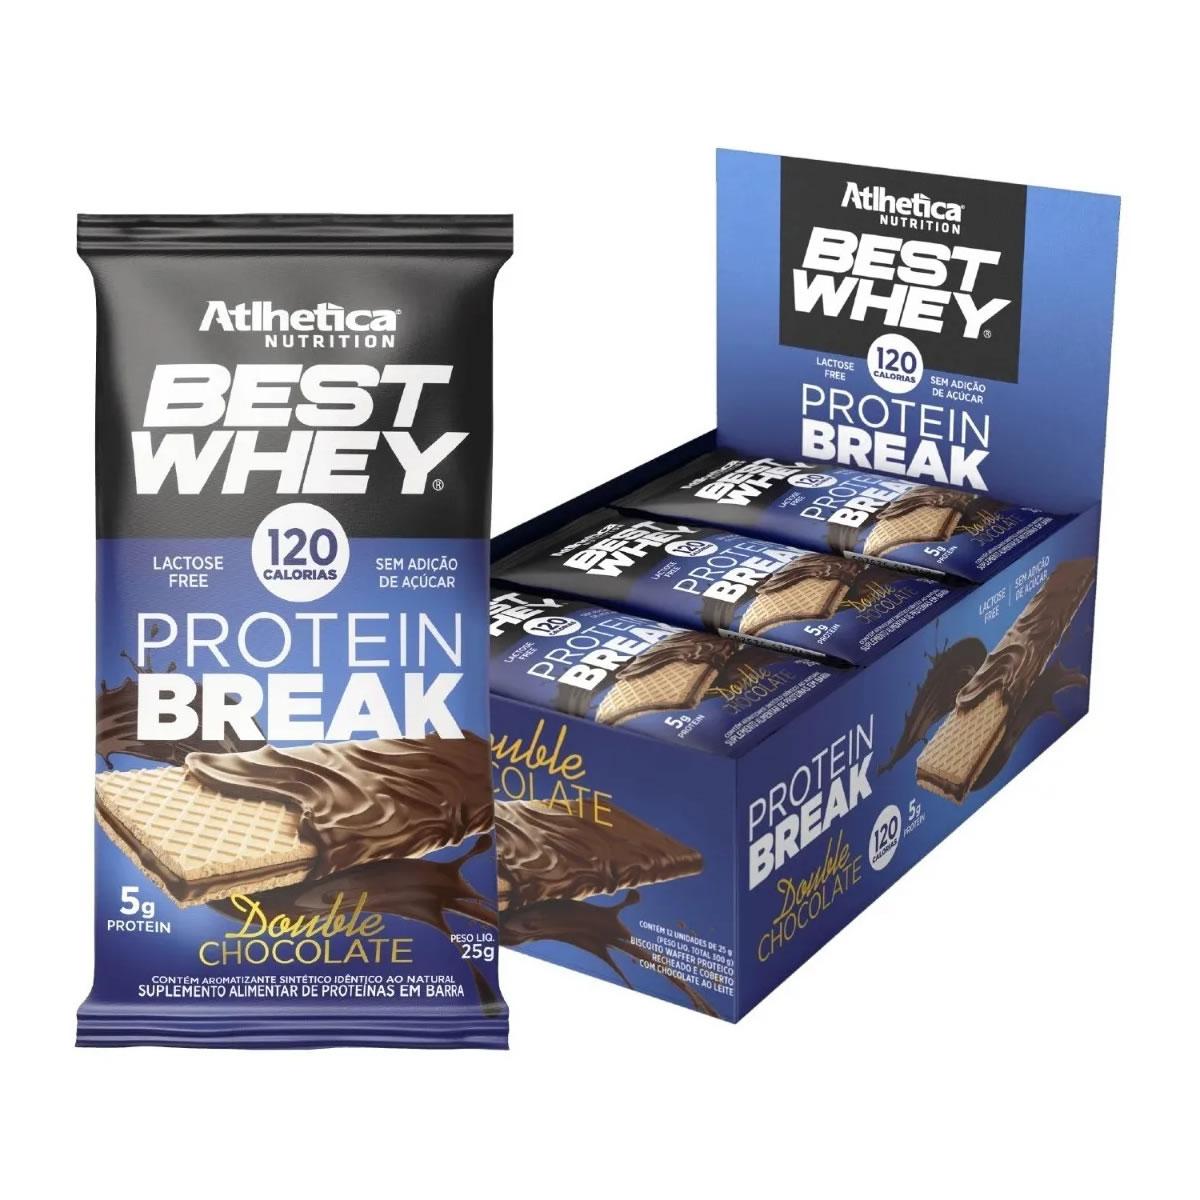 Best Whey Protein Break 12 Unidades - Atlhetica Nutrition